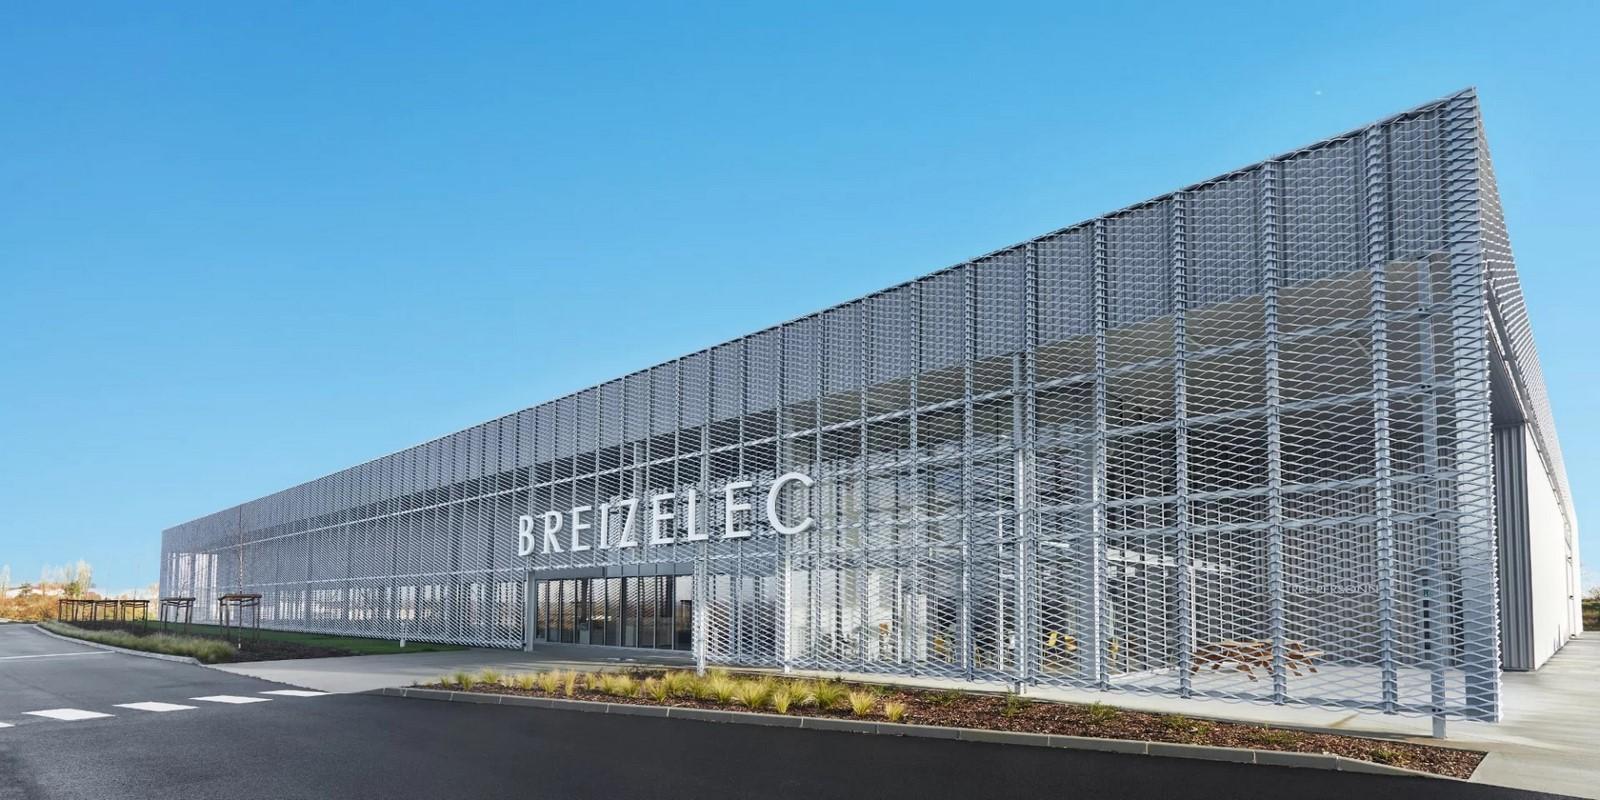 Architects in Brest - Top 30 Architects in Brest - Sheet26